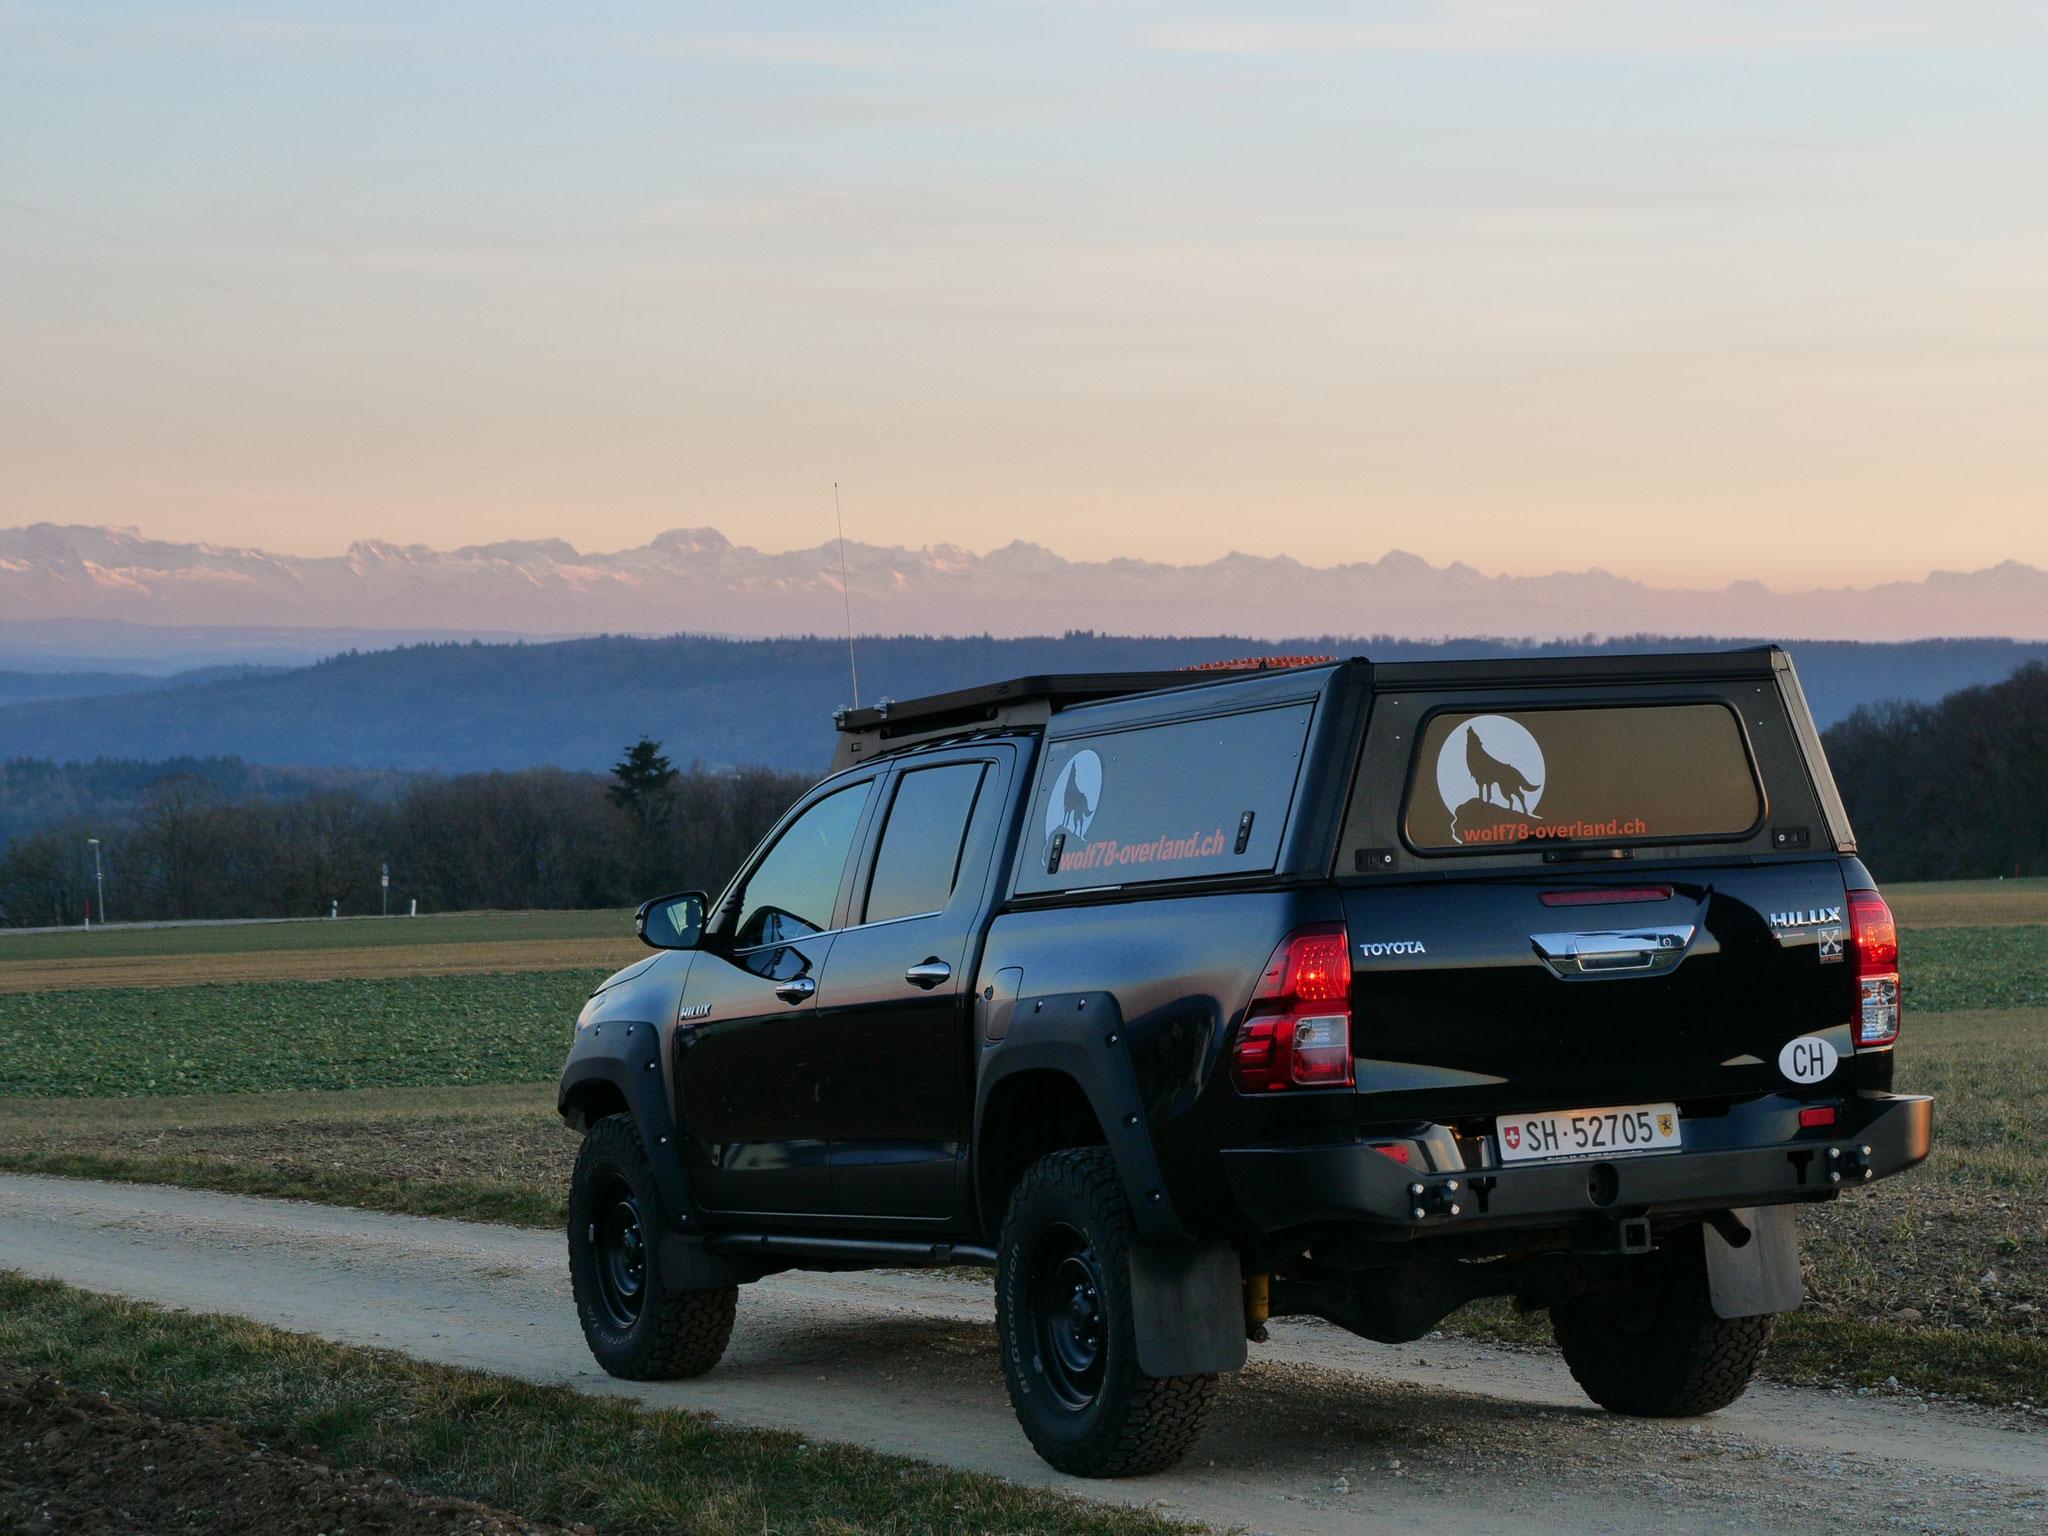 "Toyota Hilux Revo 2017 2.4 #ProjektBlackwolf Alu-cab offroad overland expedition 4x4  ARB Frontrunner Rocksliders Roofrack Rival skidplate James Baroud Discovery Awining Markise bfgoodrich 285/70R17 33"" Tires TJM Sknorkel wolf78-overland.ch"